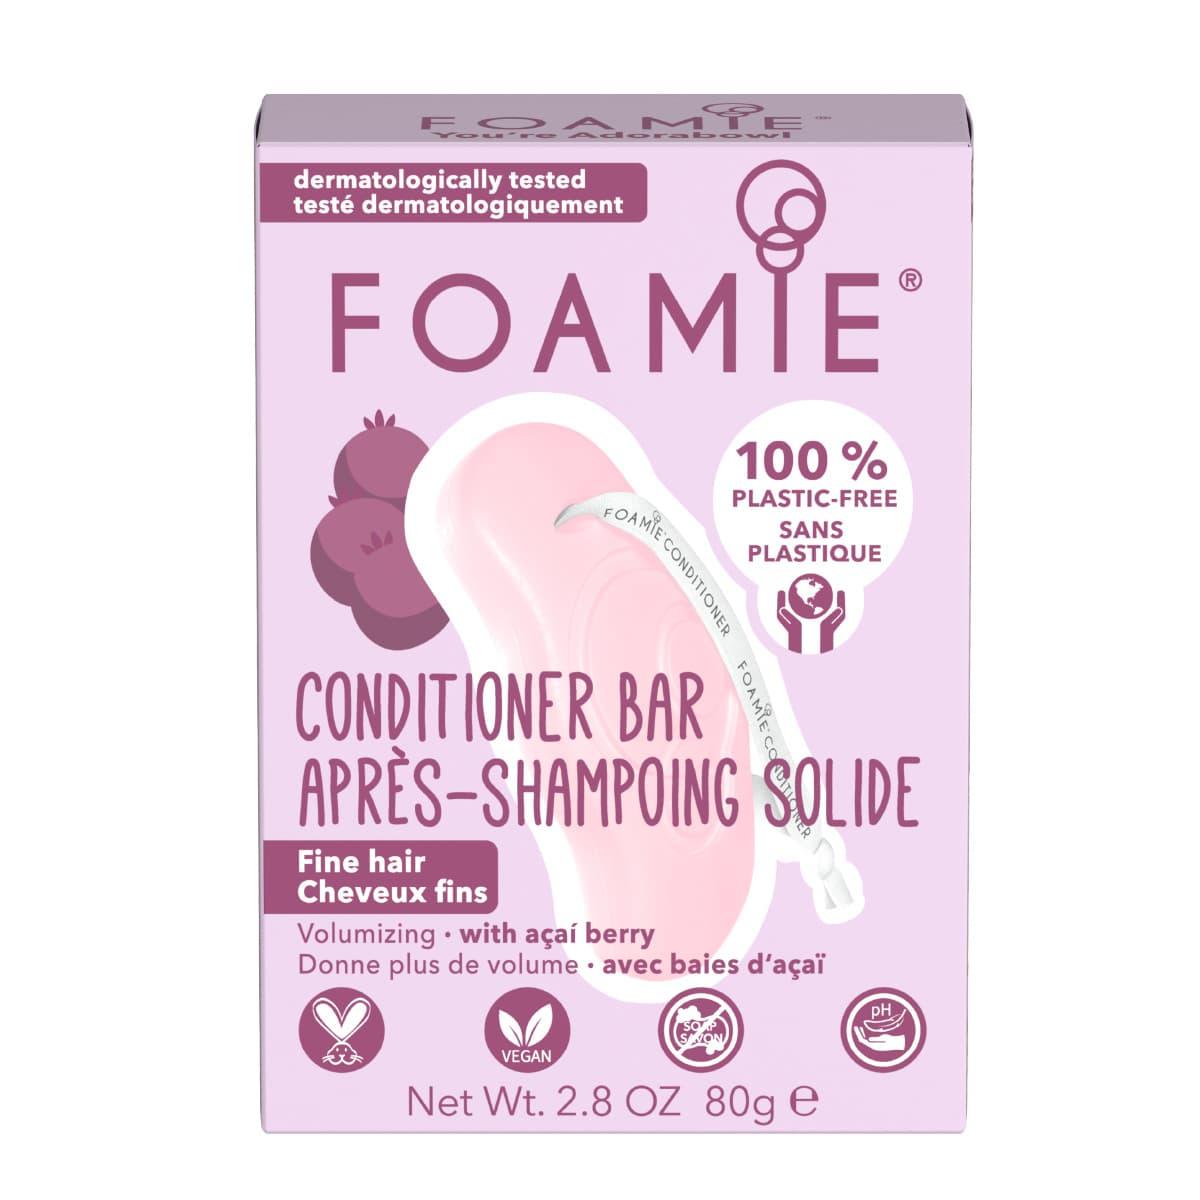 Foamie - Après-shampoing solide - You're Adorabowl